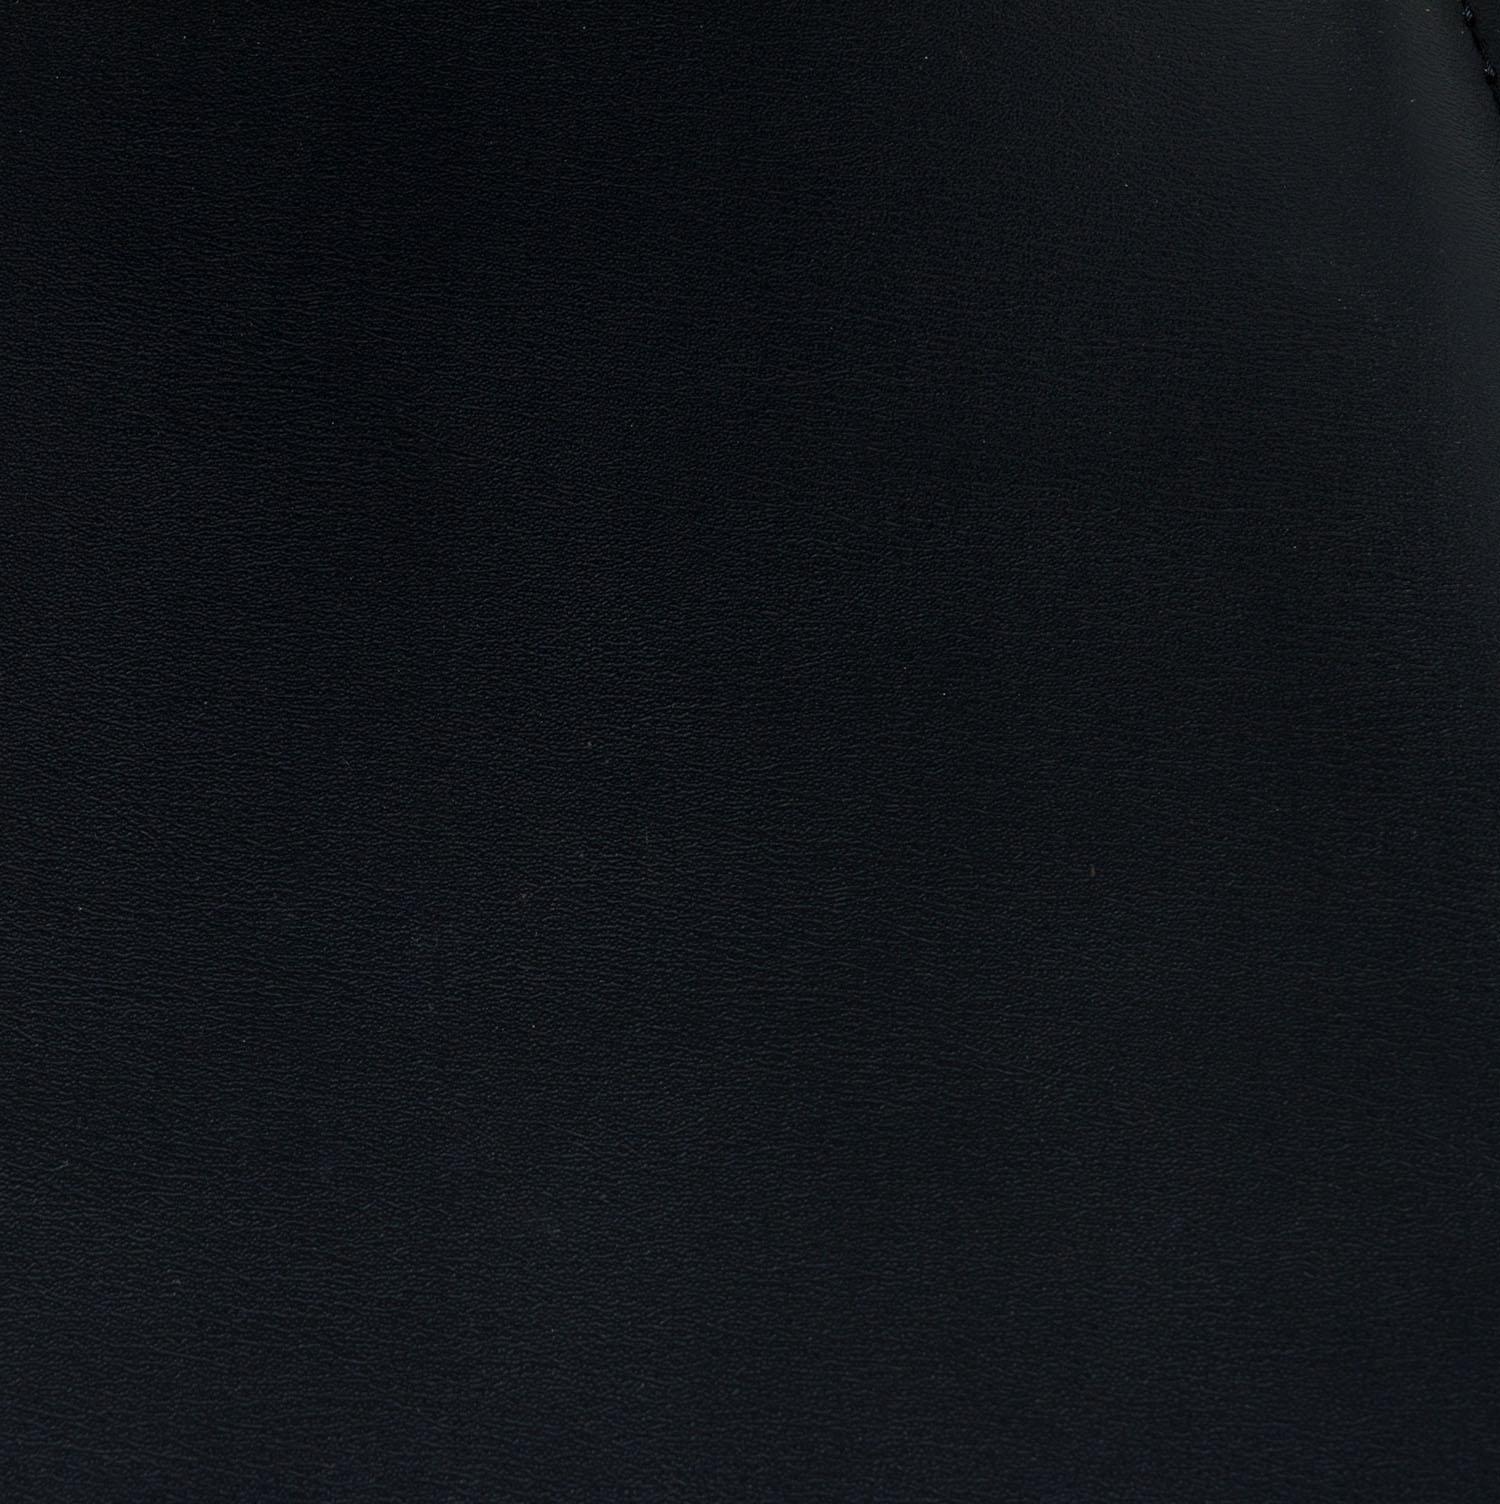 goSIT-Black-Leather-Stack-04.jpg